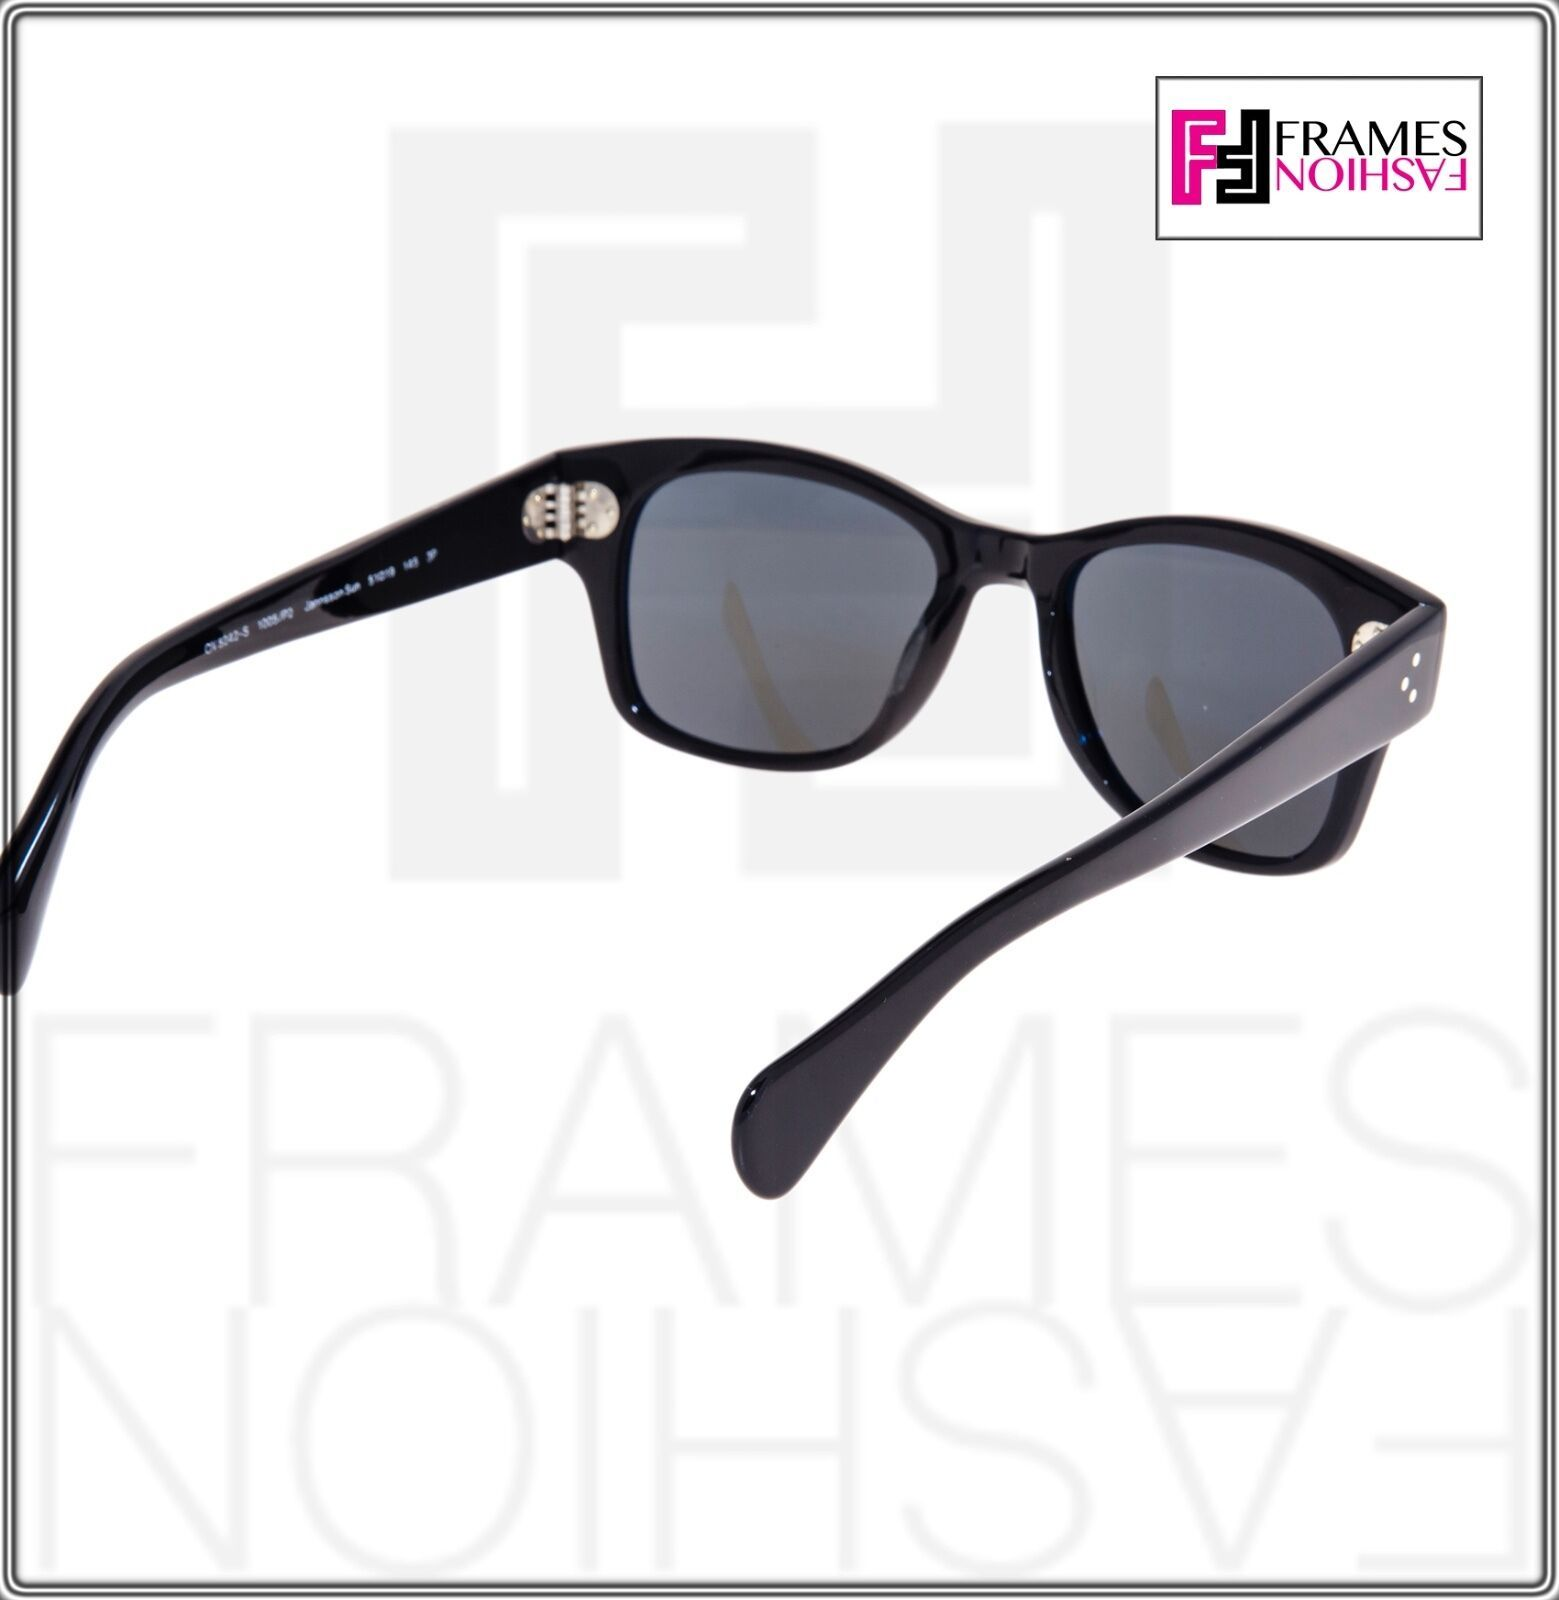 OLIVER PEOPLES Jannsson Sun OV5242S Shiny Black VFX Polarized Sunglasses 5242 image 4